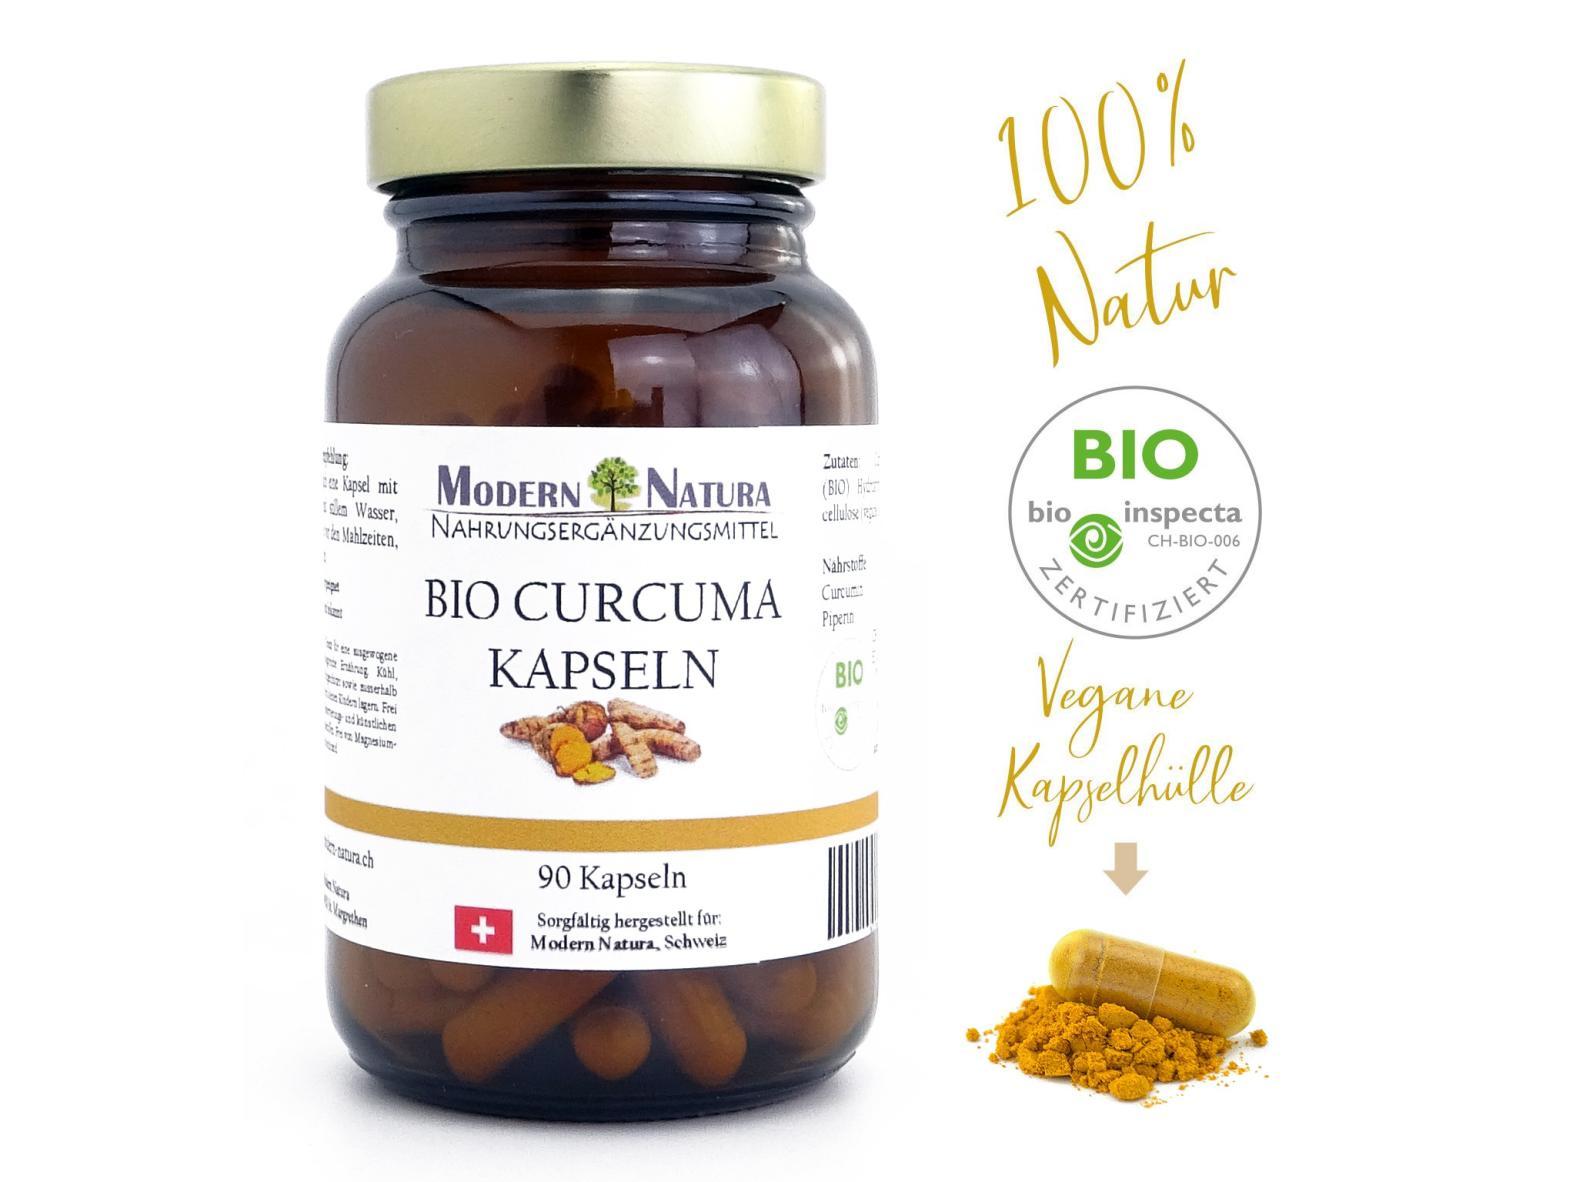 BIO Kurkuma / Curcuma - 1x 90 Kapseln Glas - Mit 400mg BIO Curcuma Pulver + 5mg BIO Schwarzer Pfeffer - Vegan & Glutenfrei